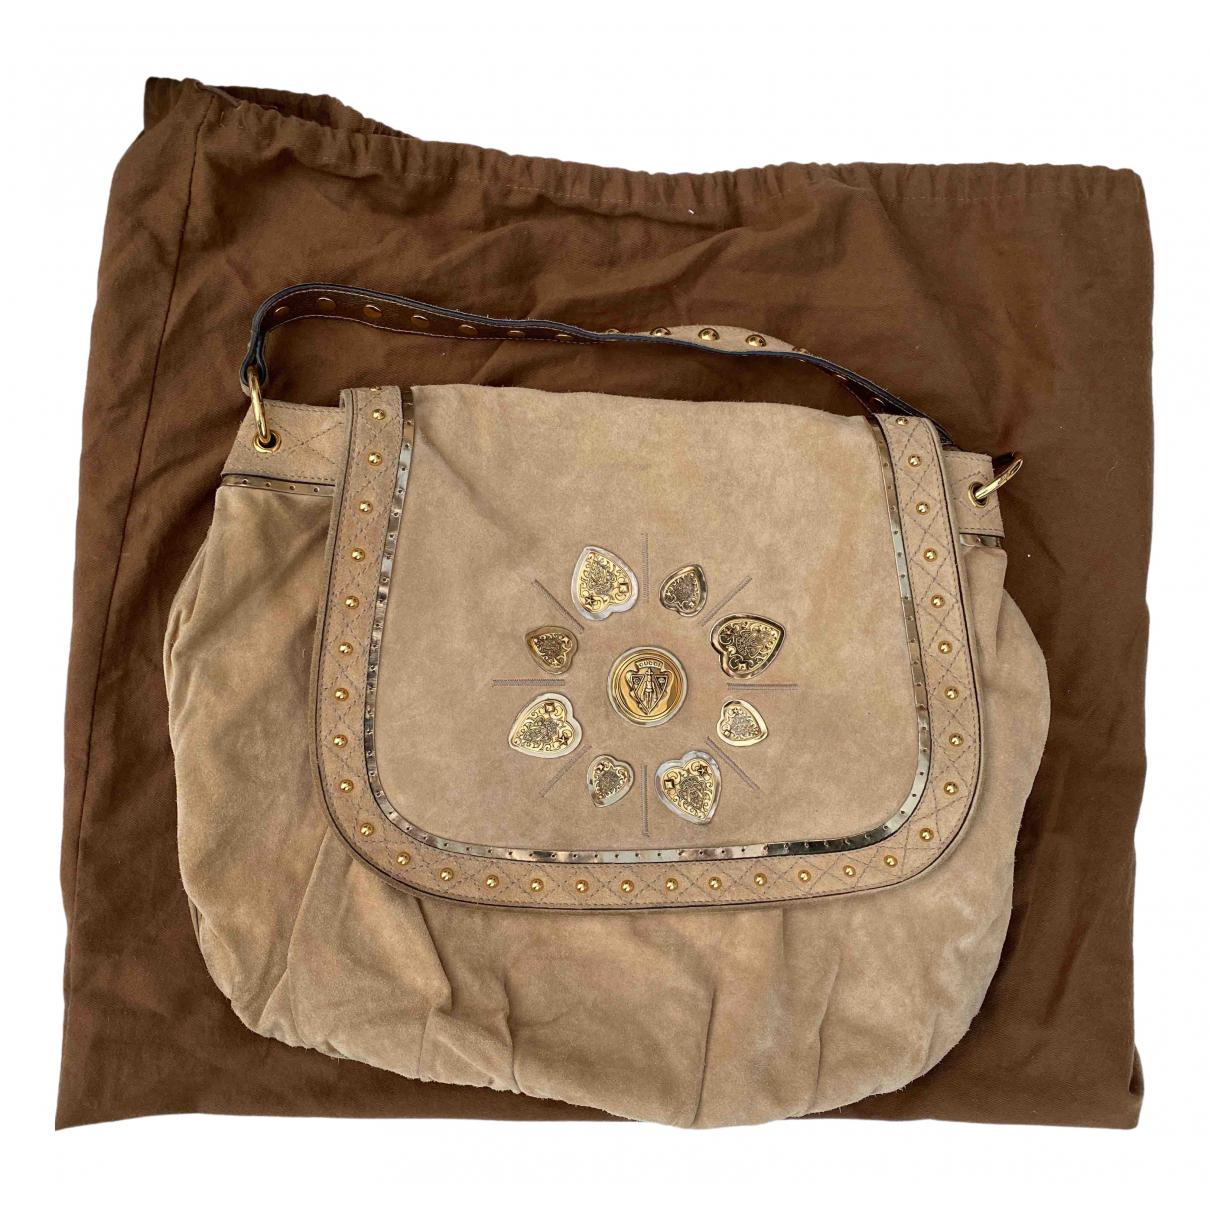 Gucci \N Beige Suede handbag for Women \N